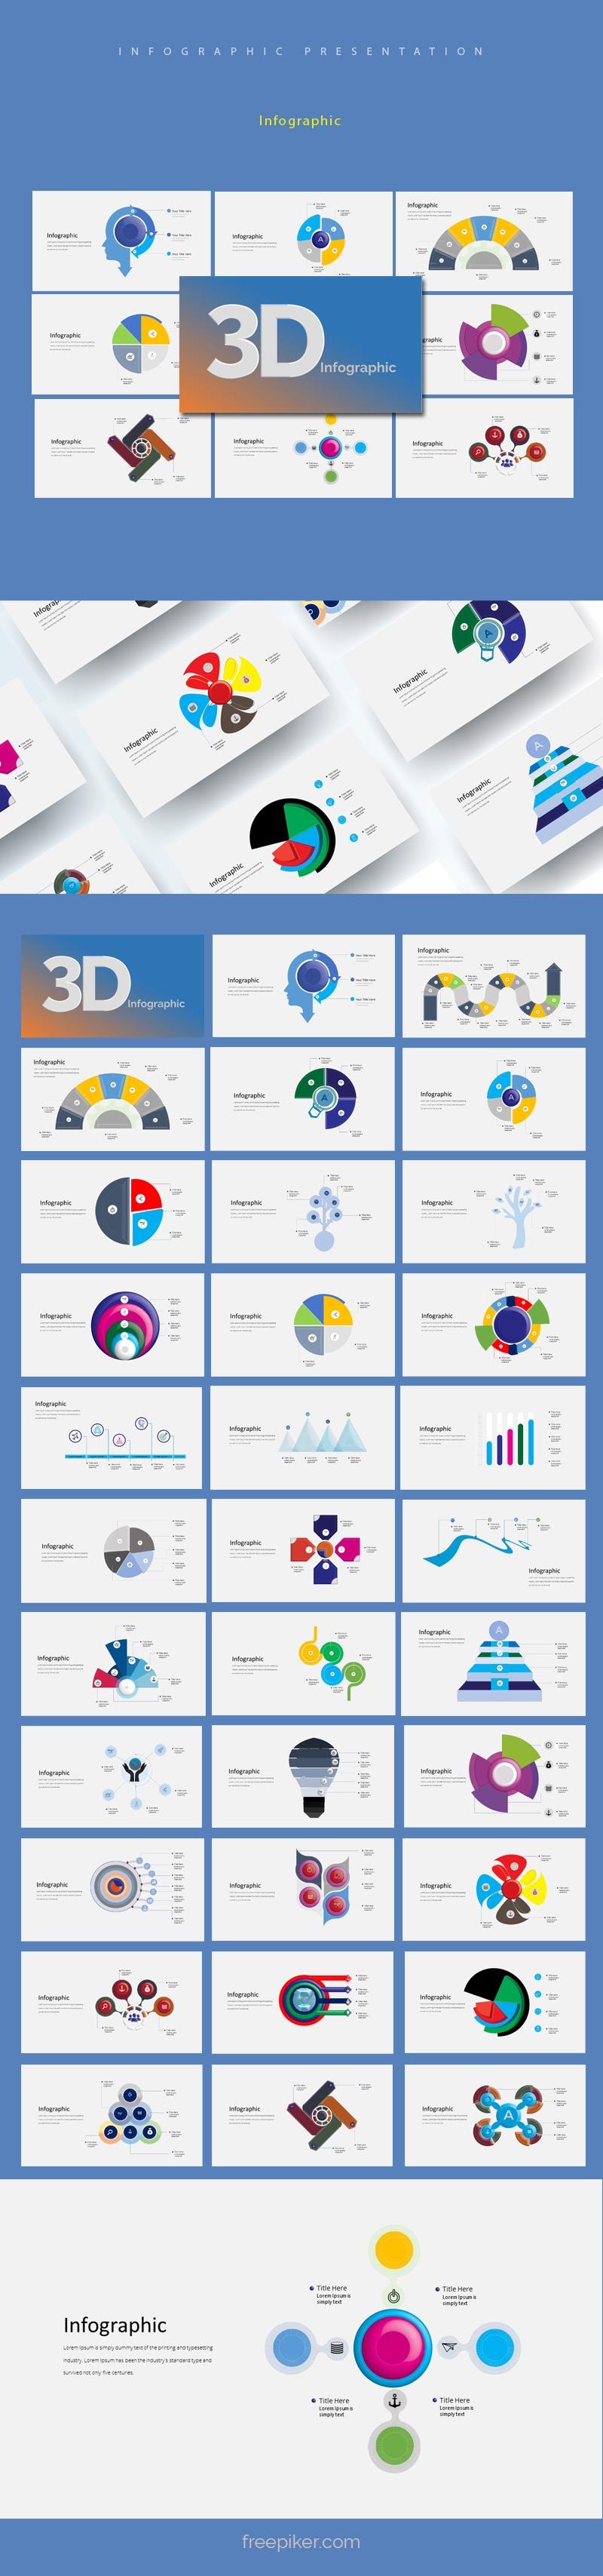 3D Infographic Powerpoint Presentation